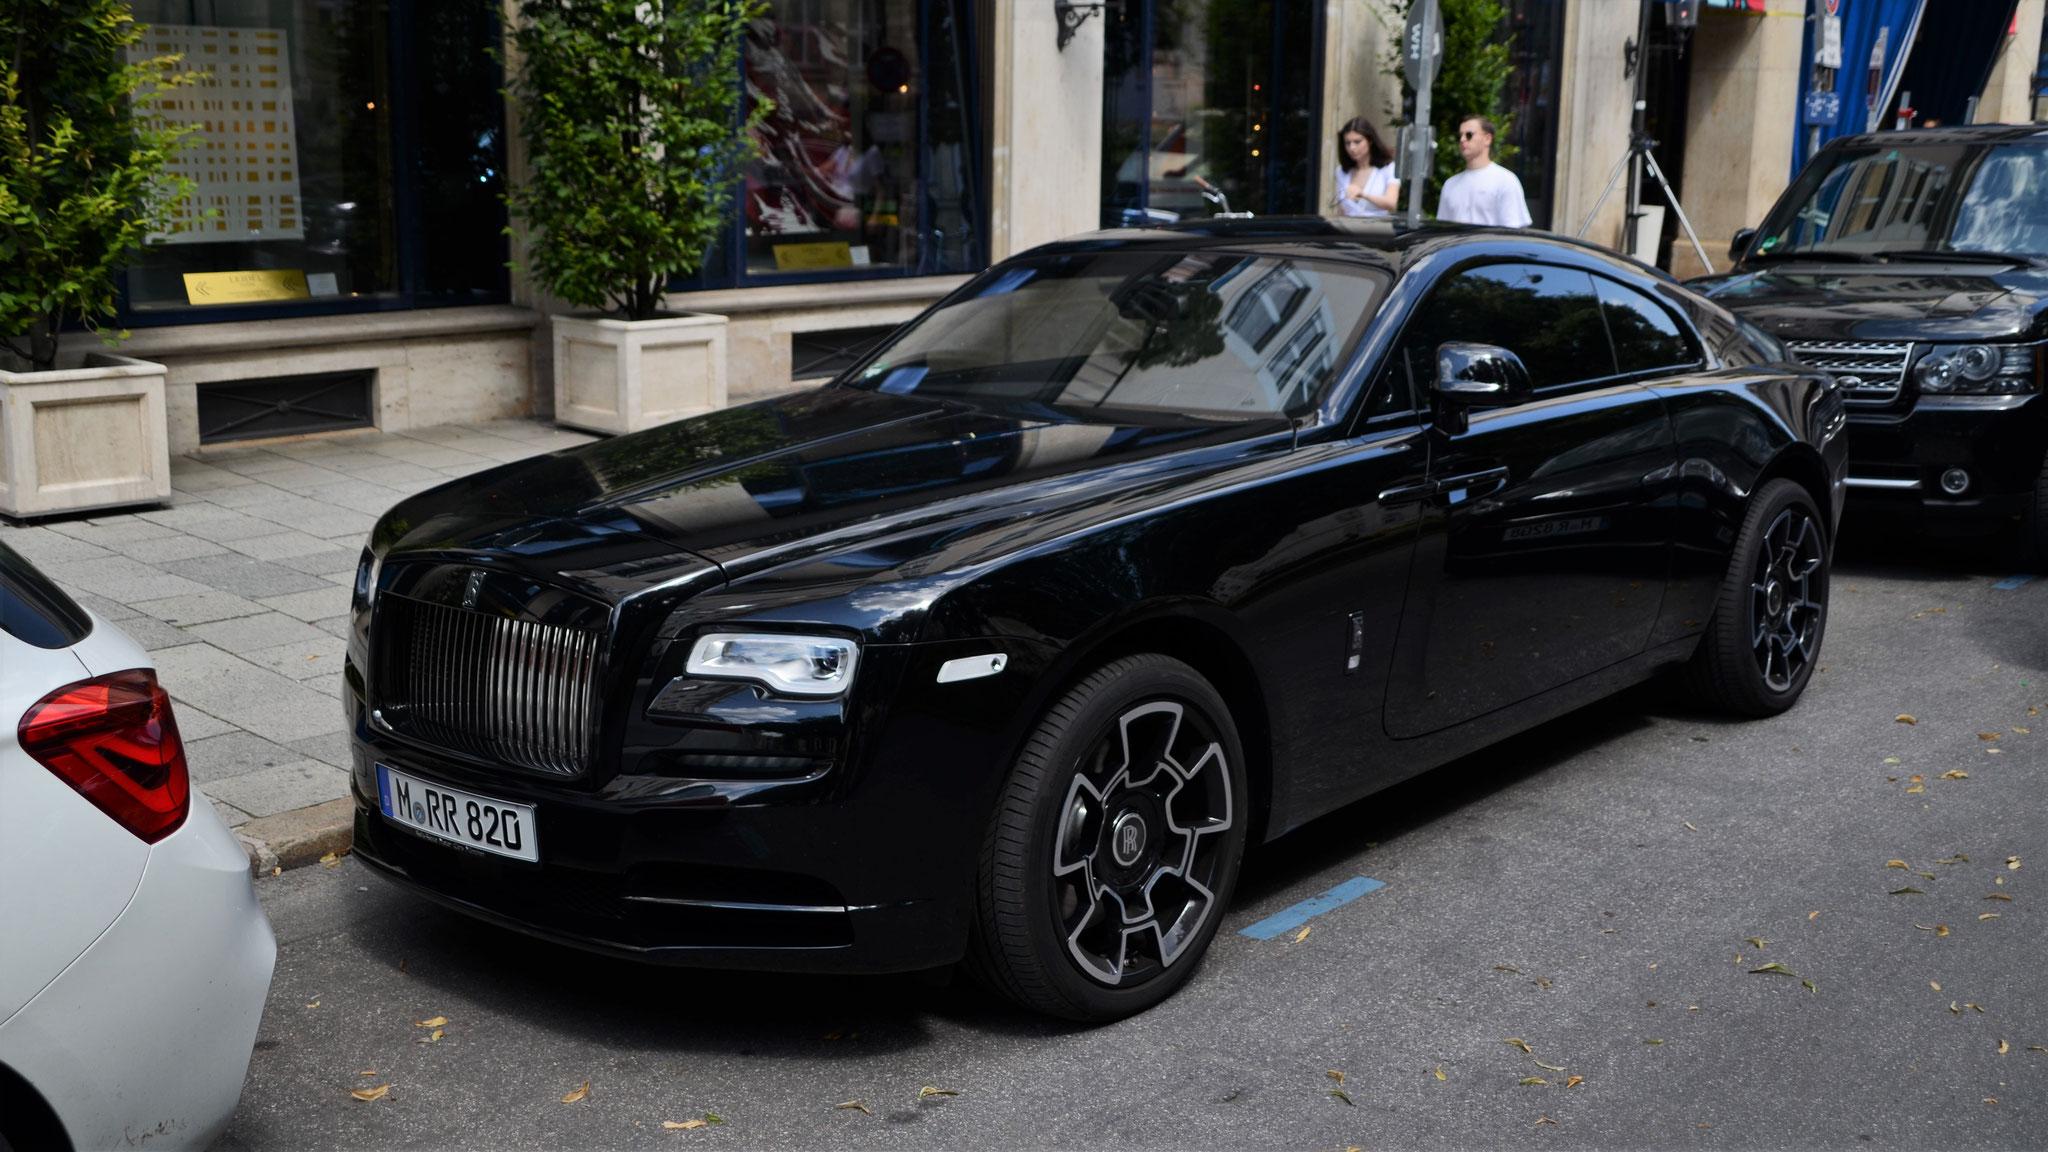 Rolls Royce Wraith Black Badge - M-RR-820